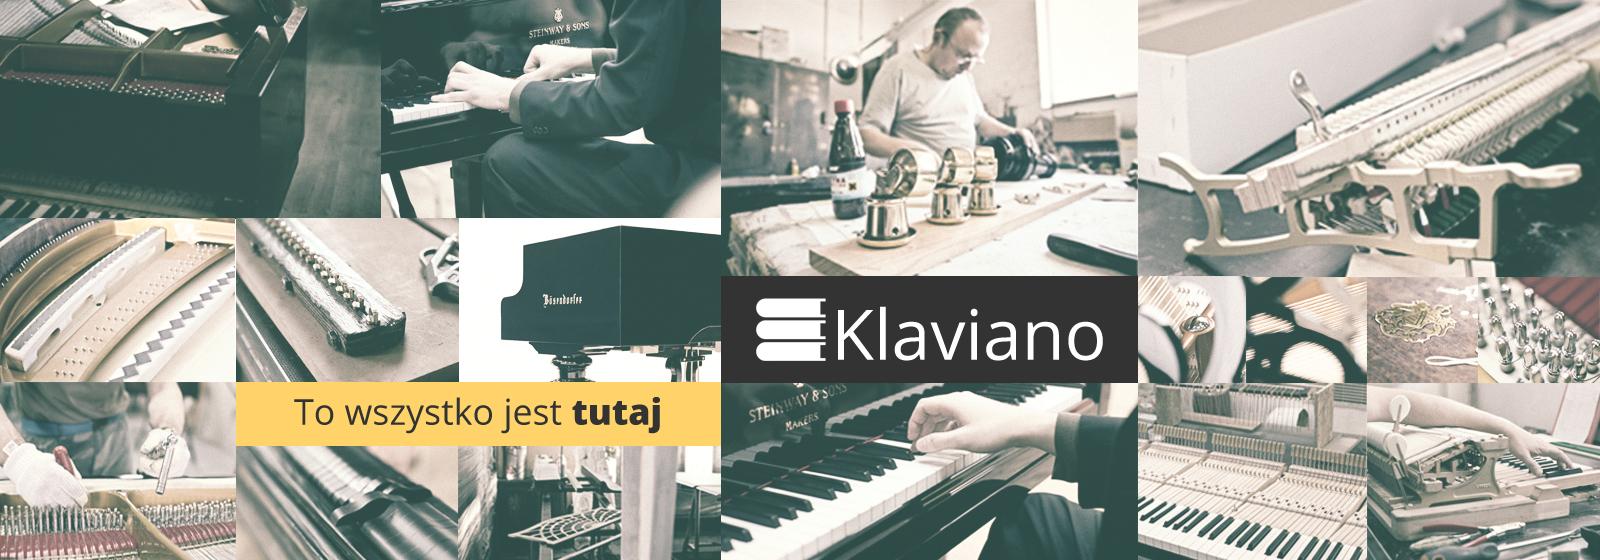 klaviano_tu